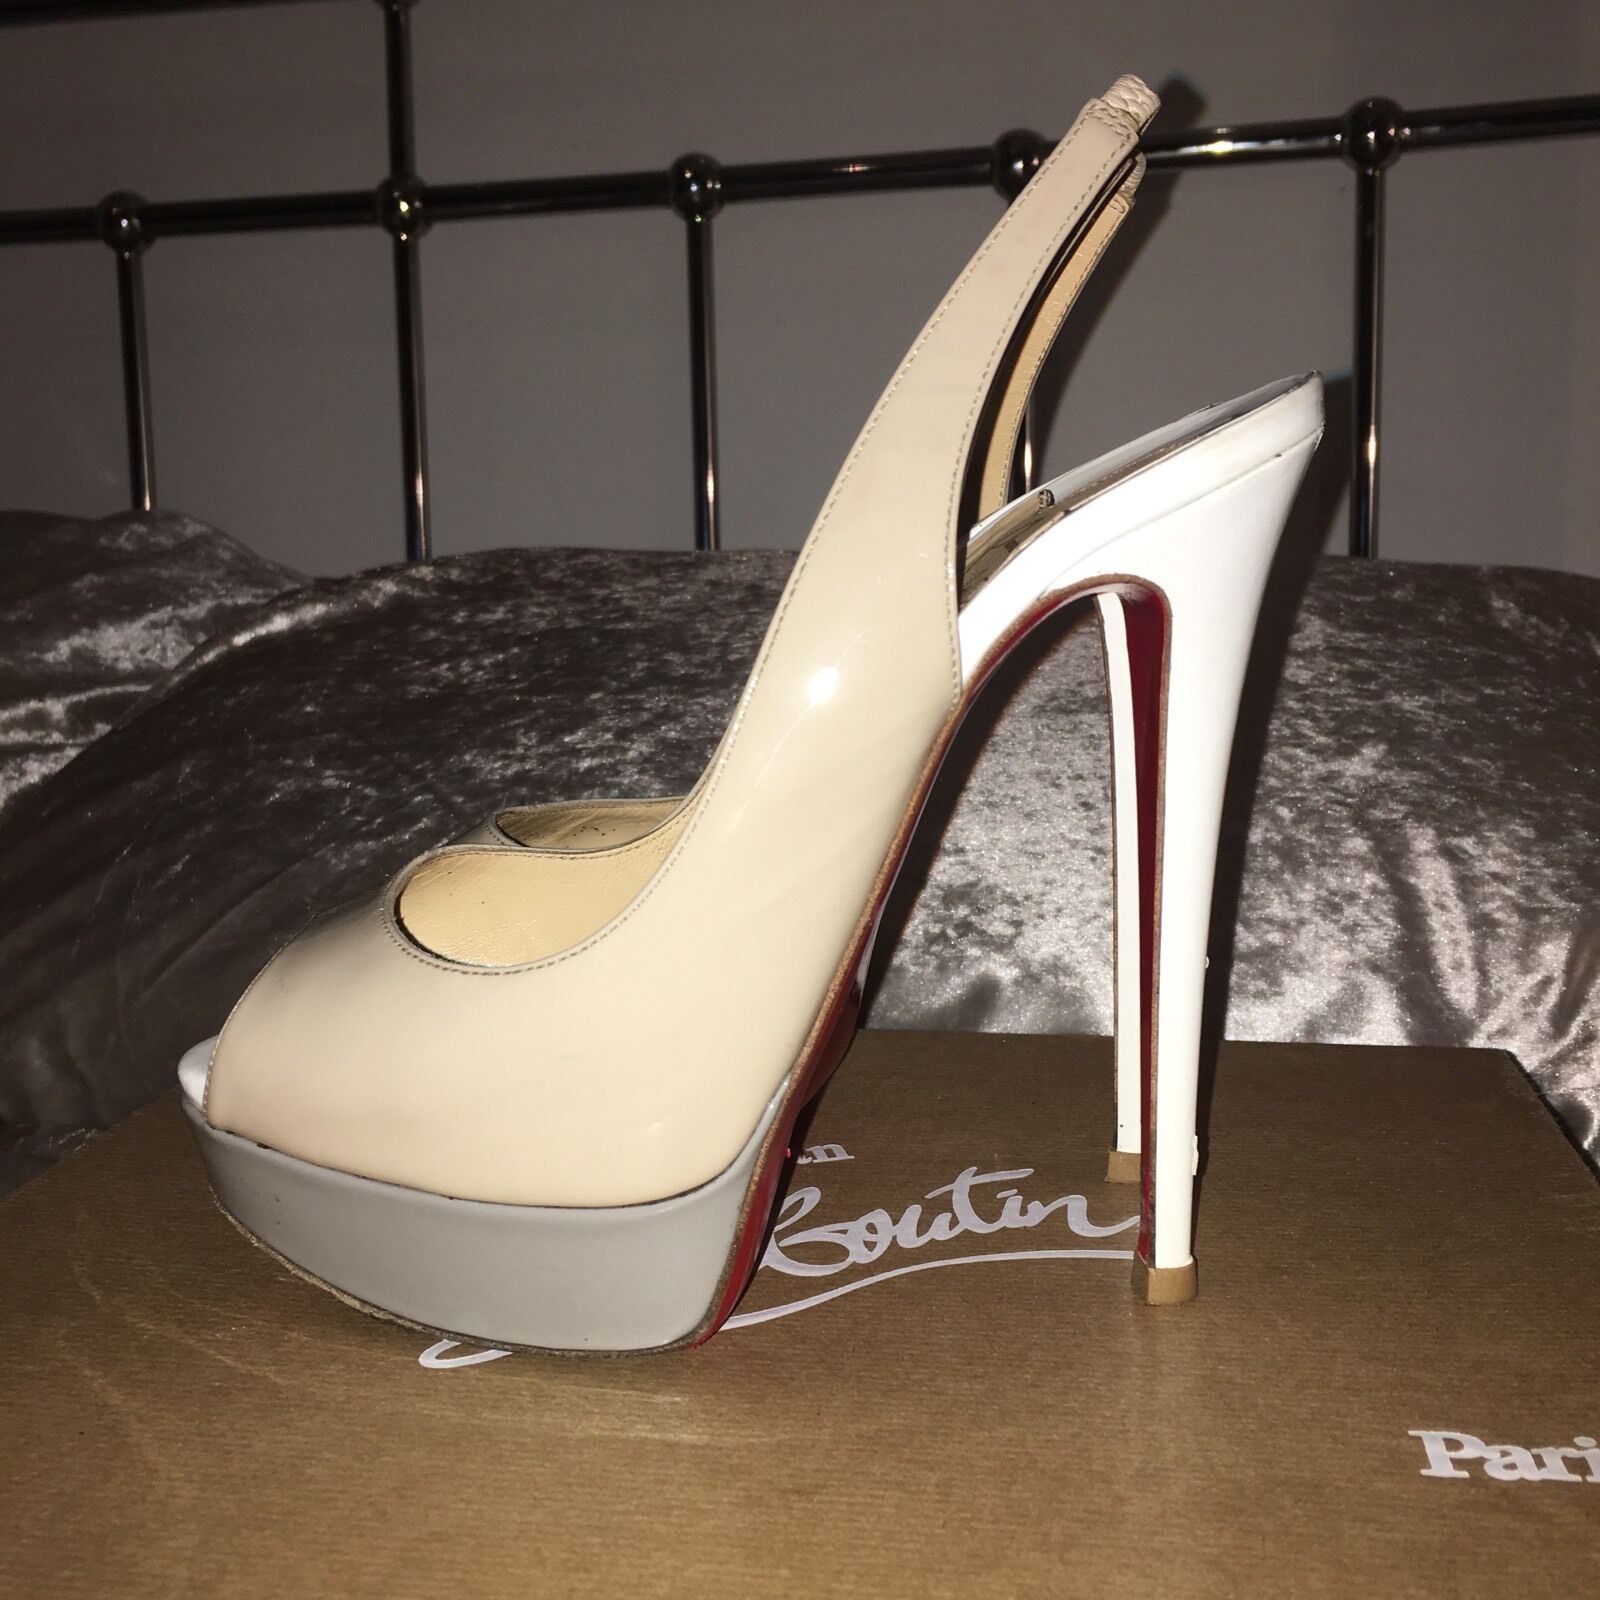 Christian Louboutin Lady Peep Sling Back Patent Nude grigio bianca  High Heel 5 38  prezzo all'ingrosso